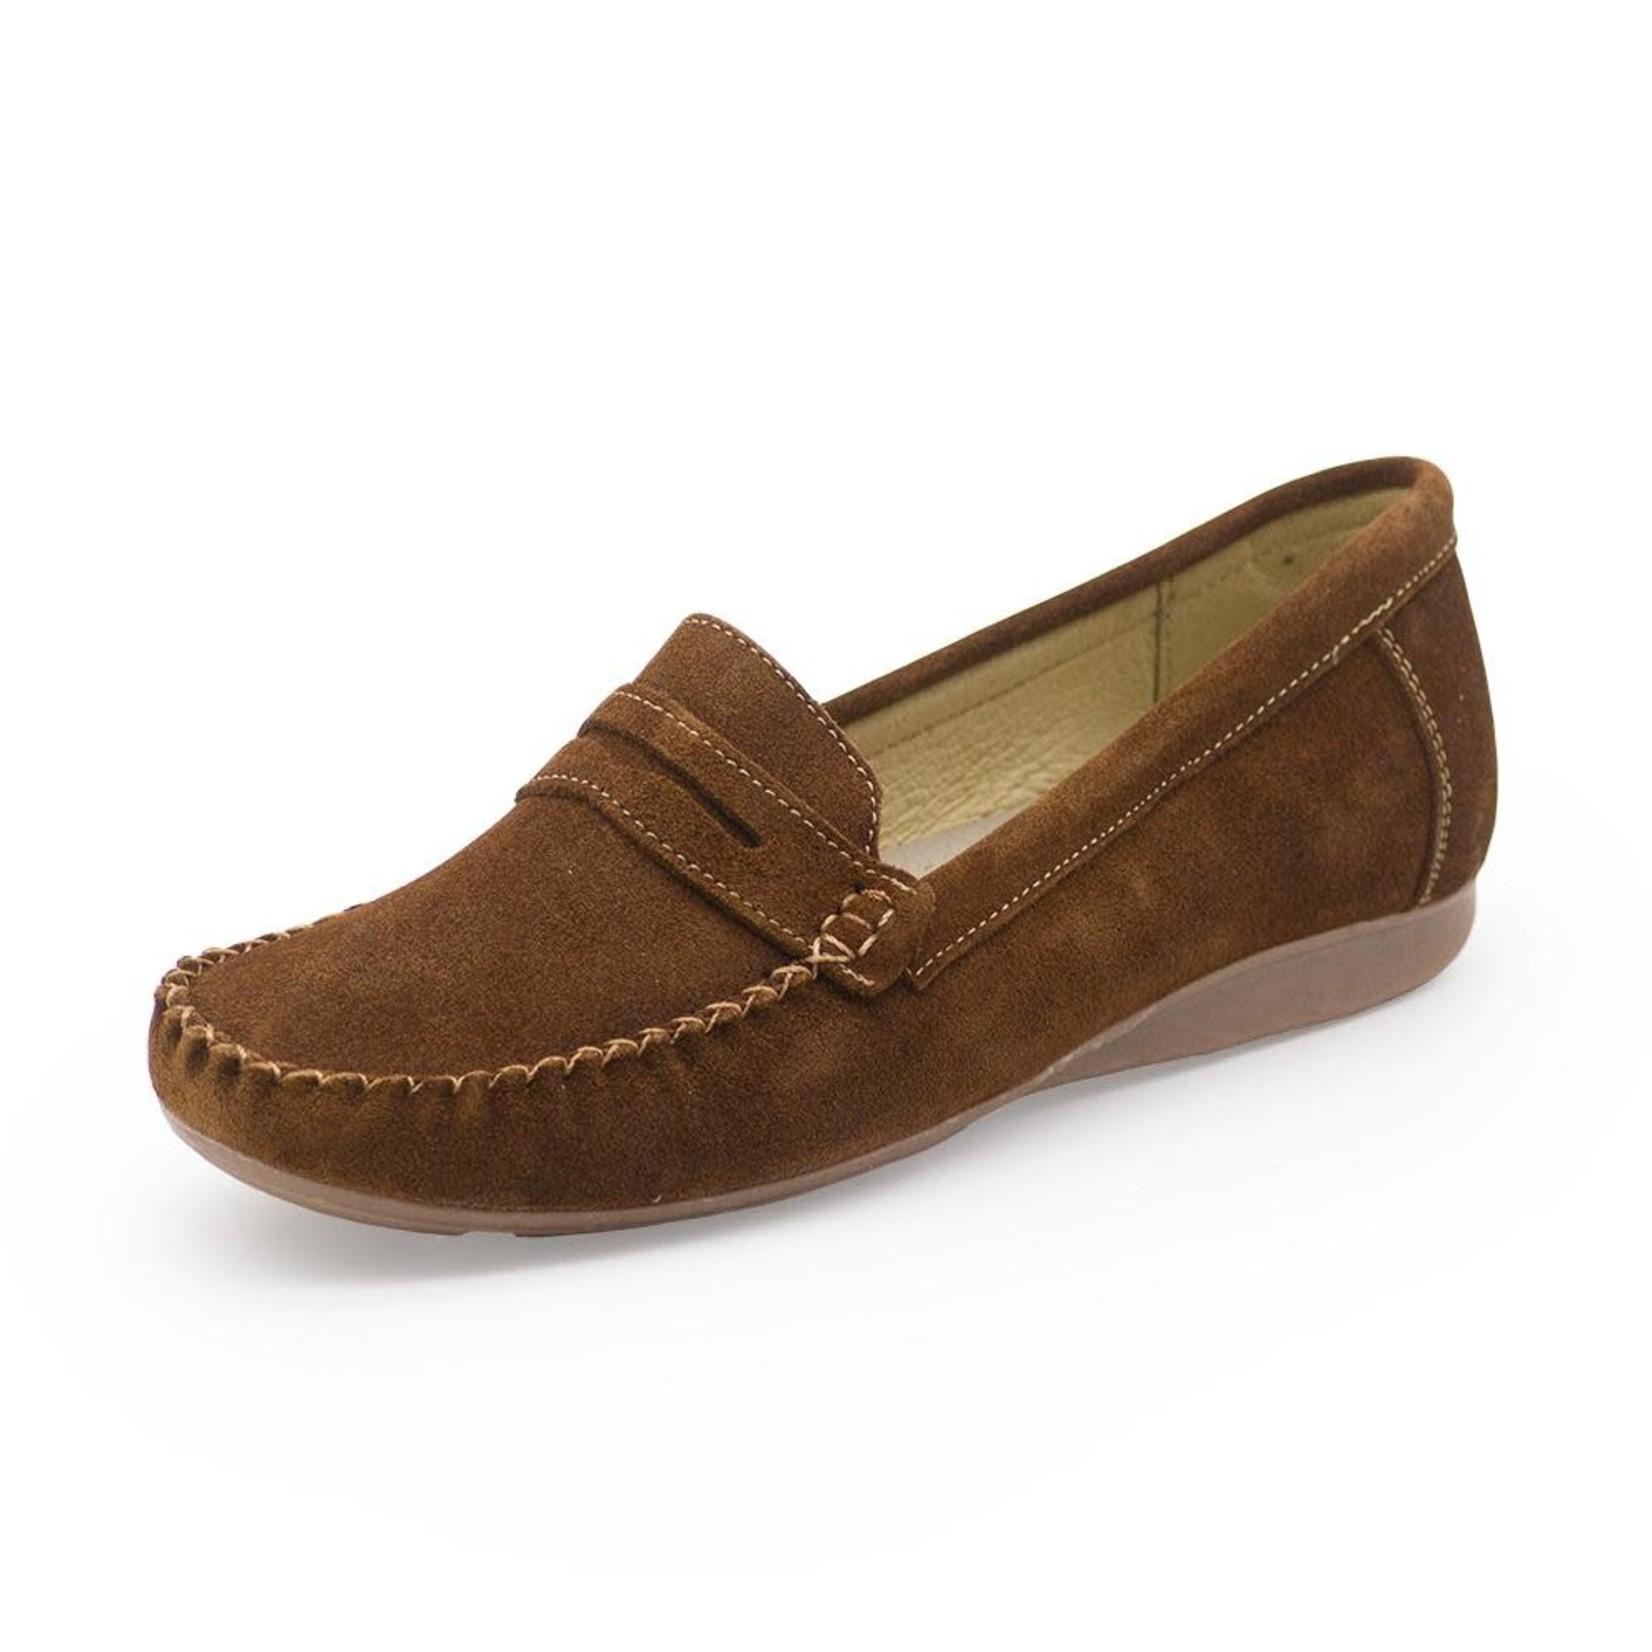 Murray Shoe in Tobacco 7